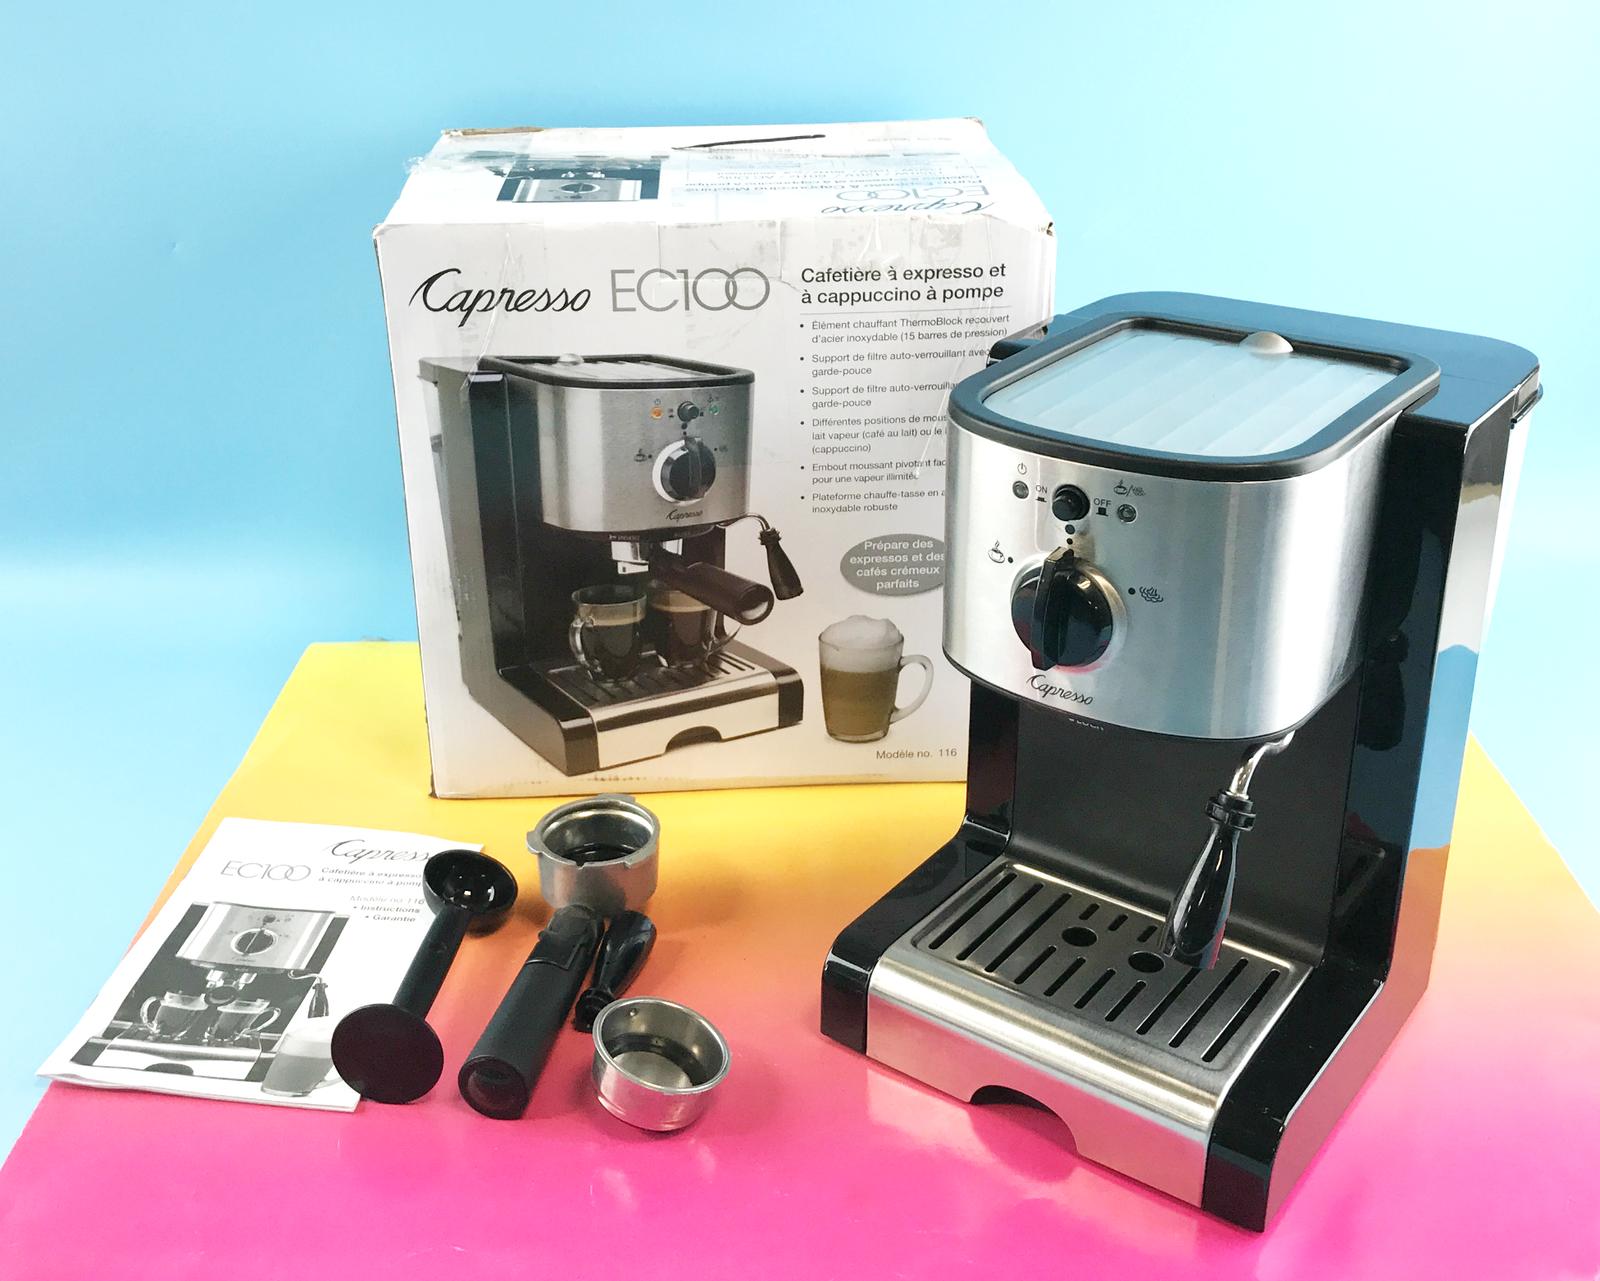 Details about Capresso EC100 Model 116 Pump Espresso and